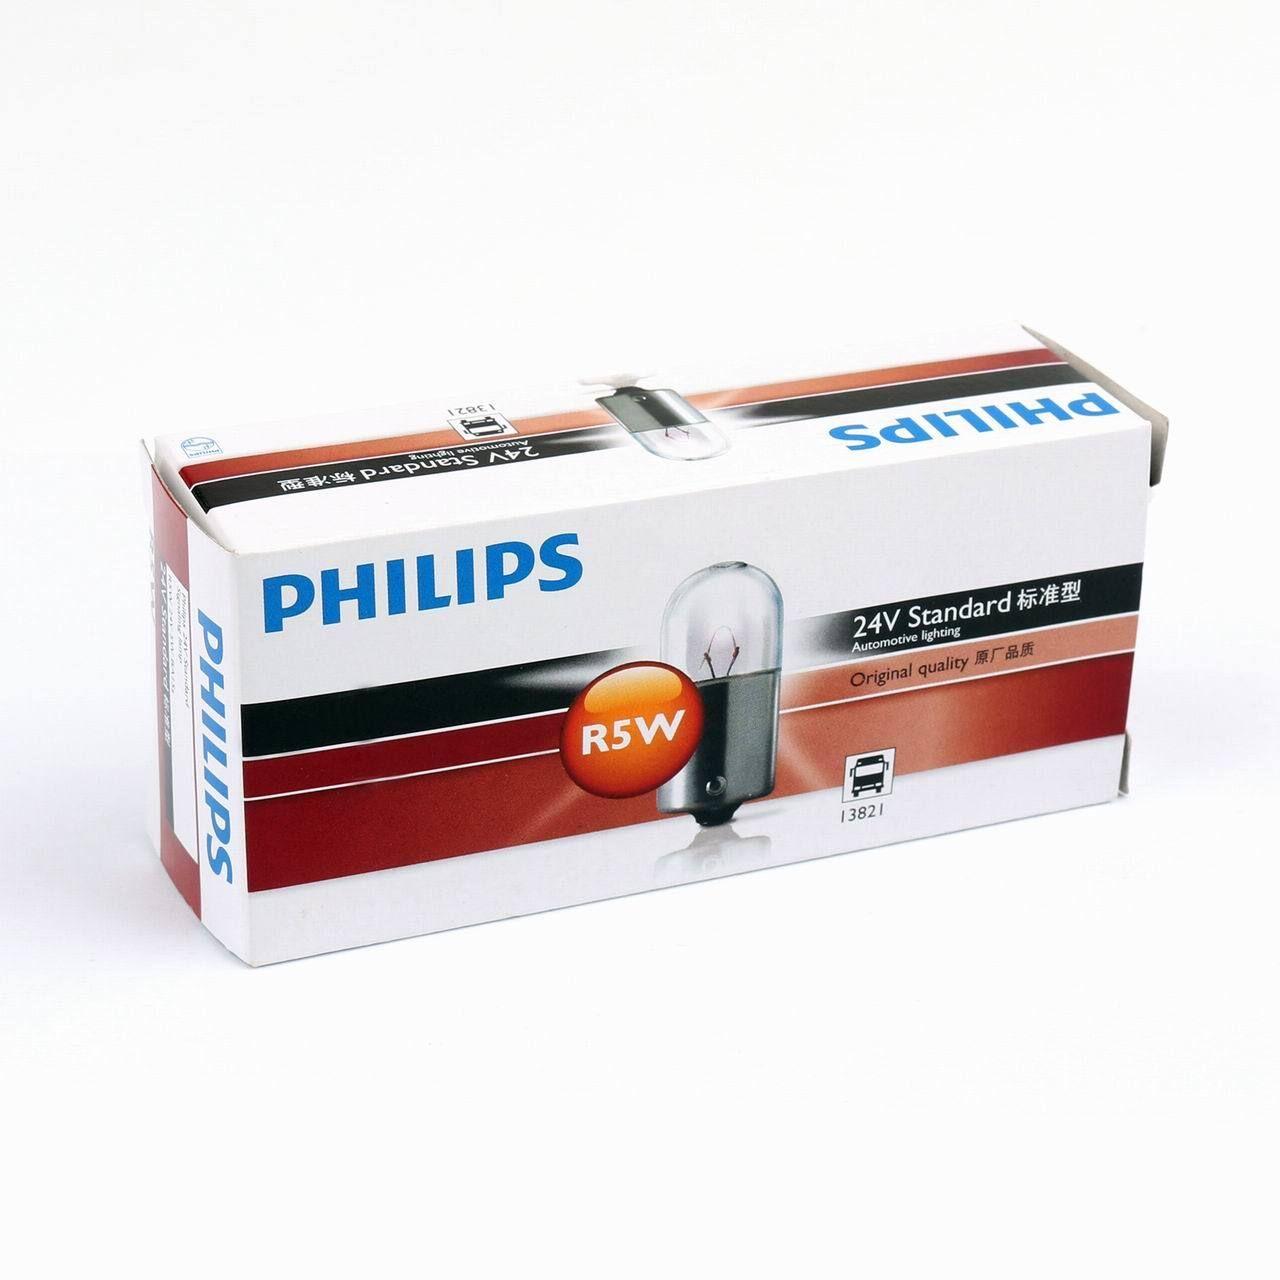 10pcs Genuine Philips 13821 R5w 24v 5w Ba15s Standard Signal Light Lamp Bulbs Lamp Bulb Lamp Light Bulb